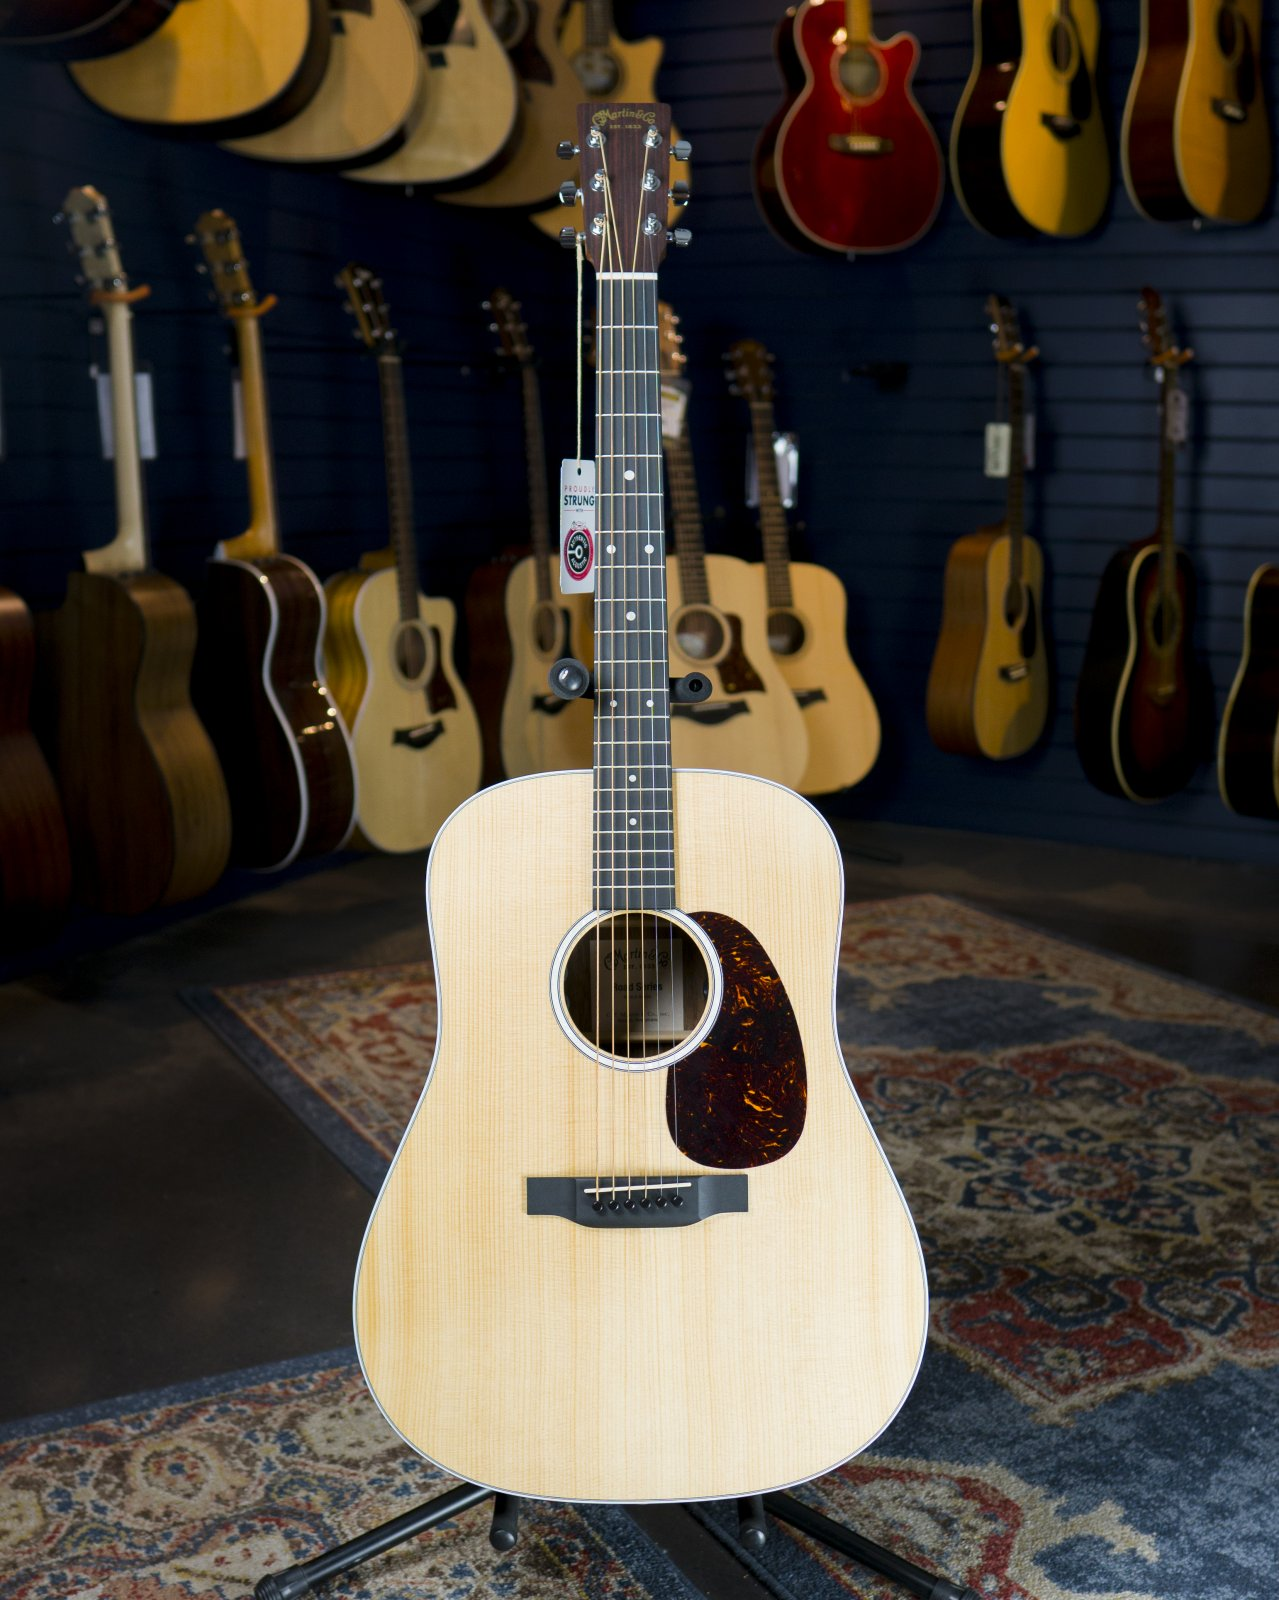 Martin D-13e Acoustic Electric Guitar